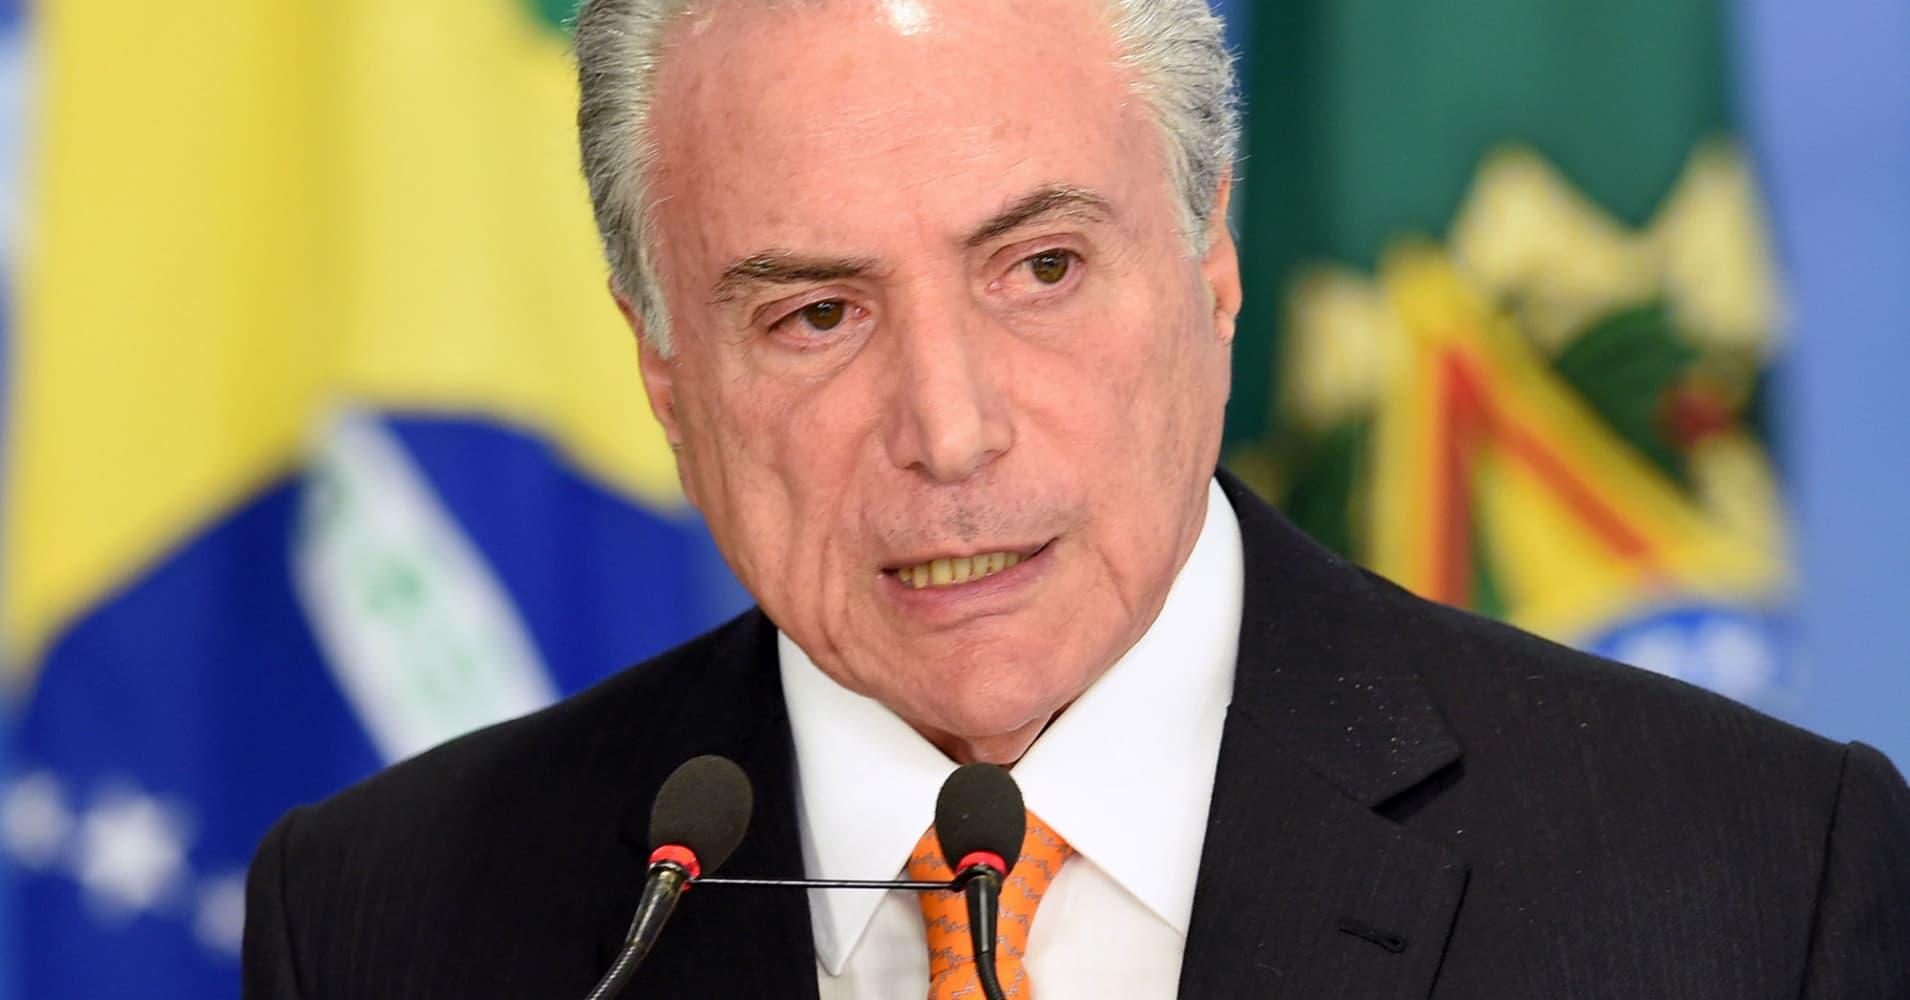 Brazil ETF set for 4% rebound as political turmoil rumbles on